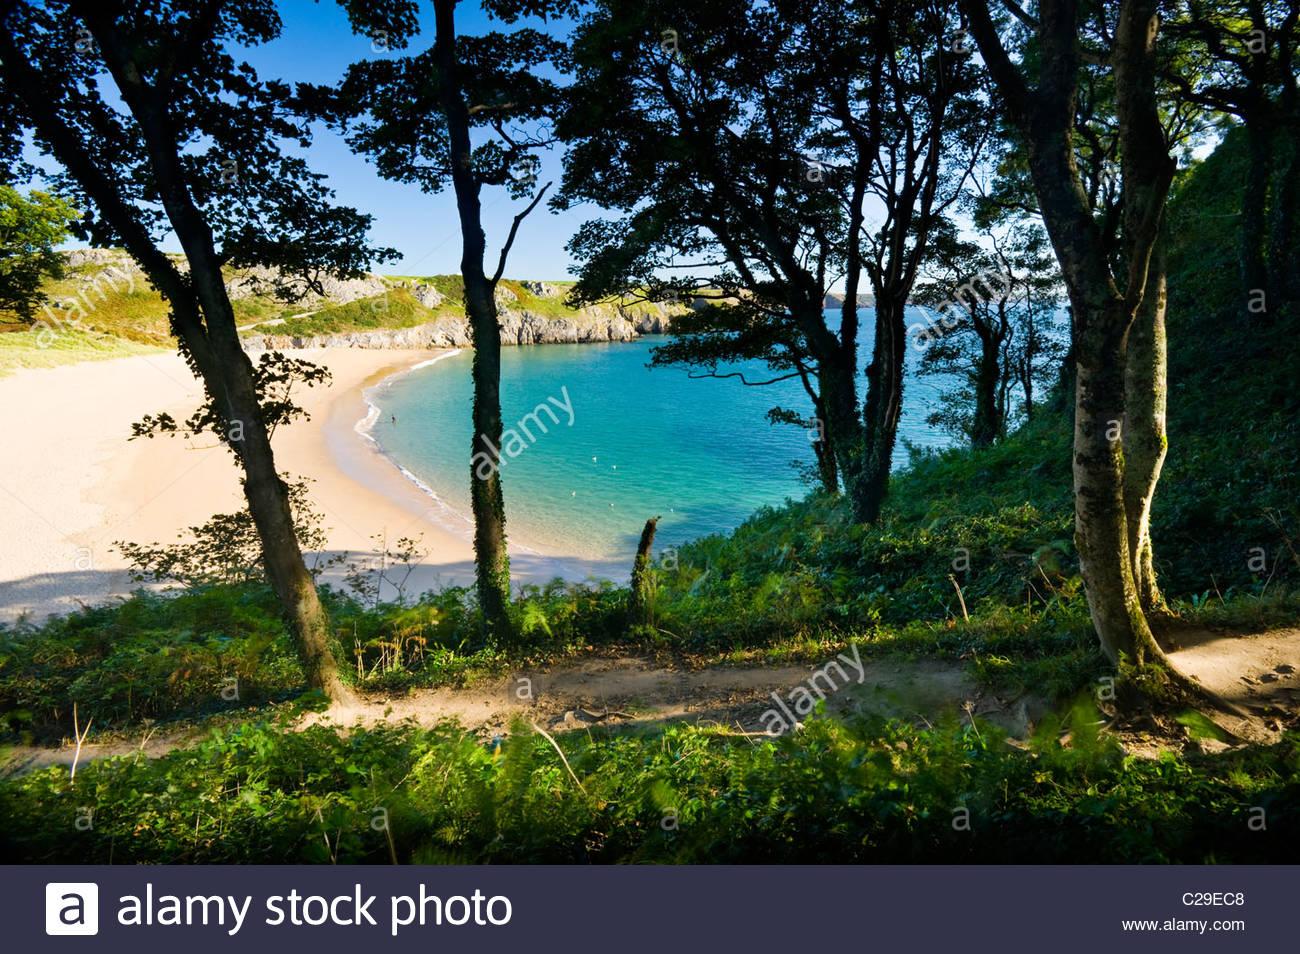 Barafundle Bay, Pembrokeshire Coast National Park, South Wales. - Stock Image